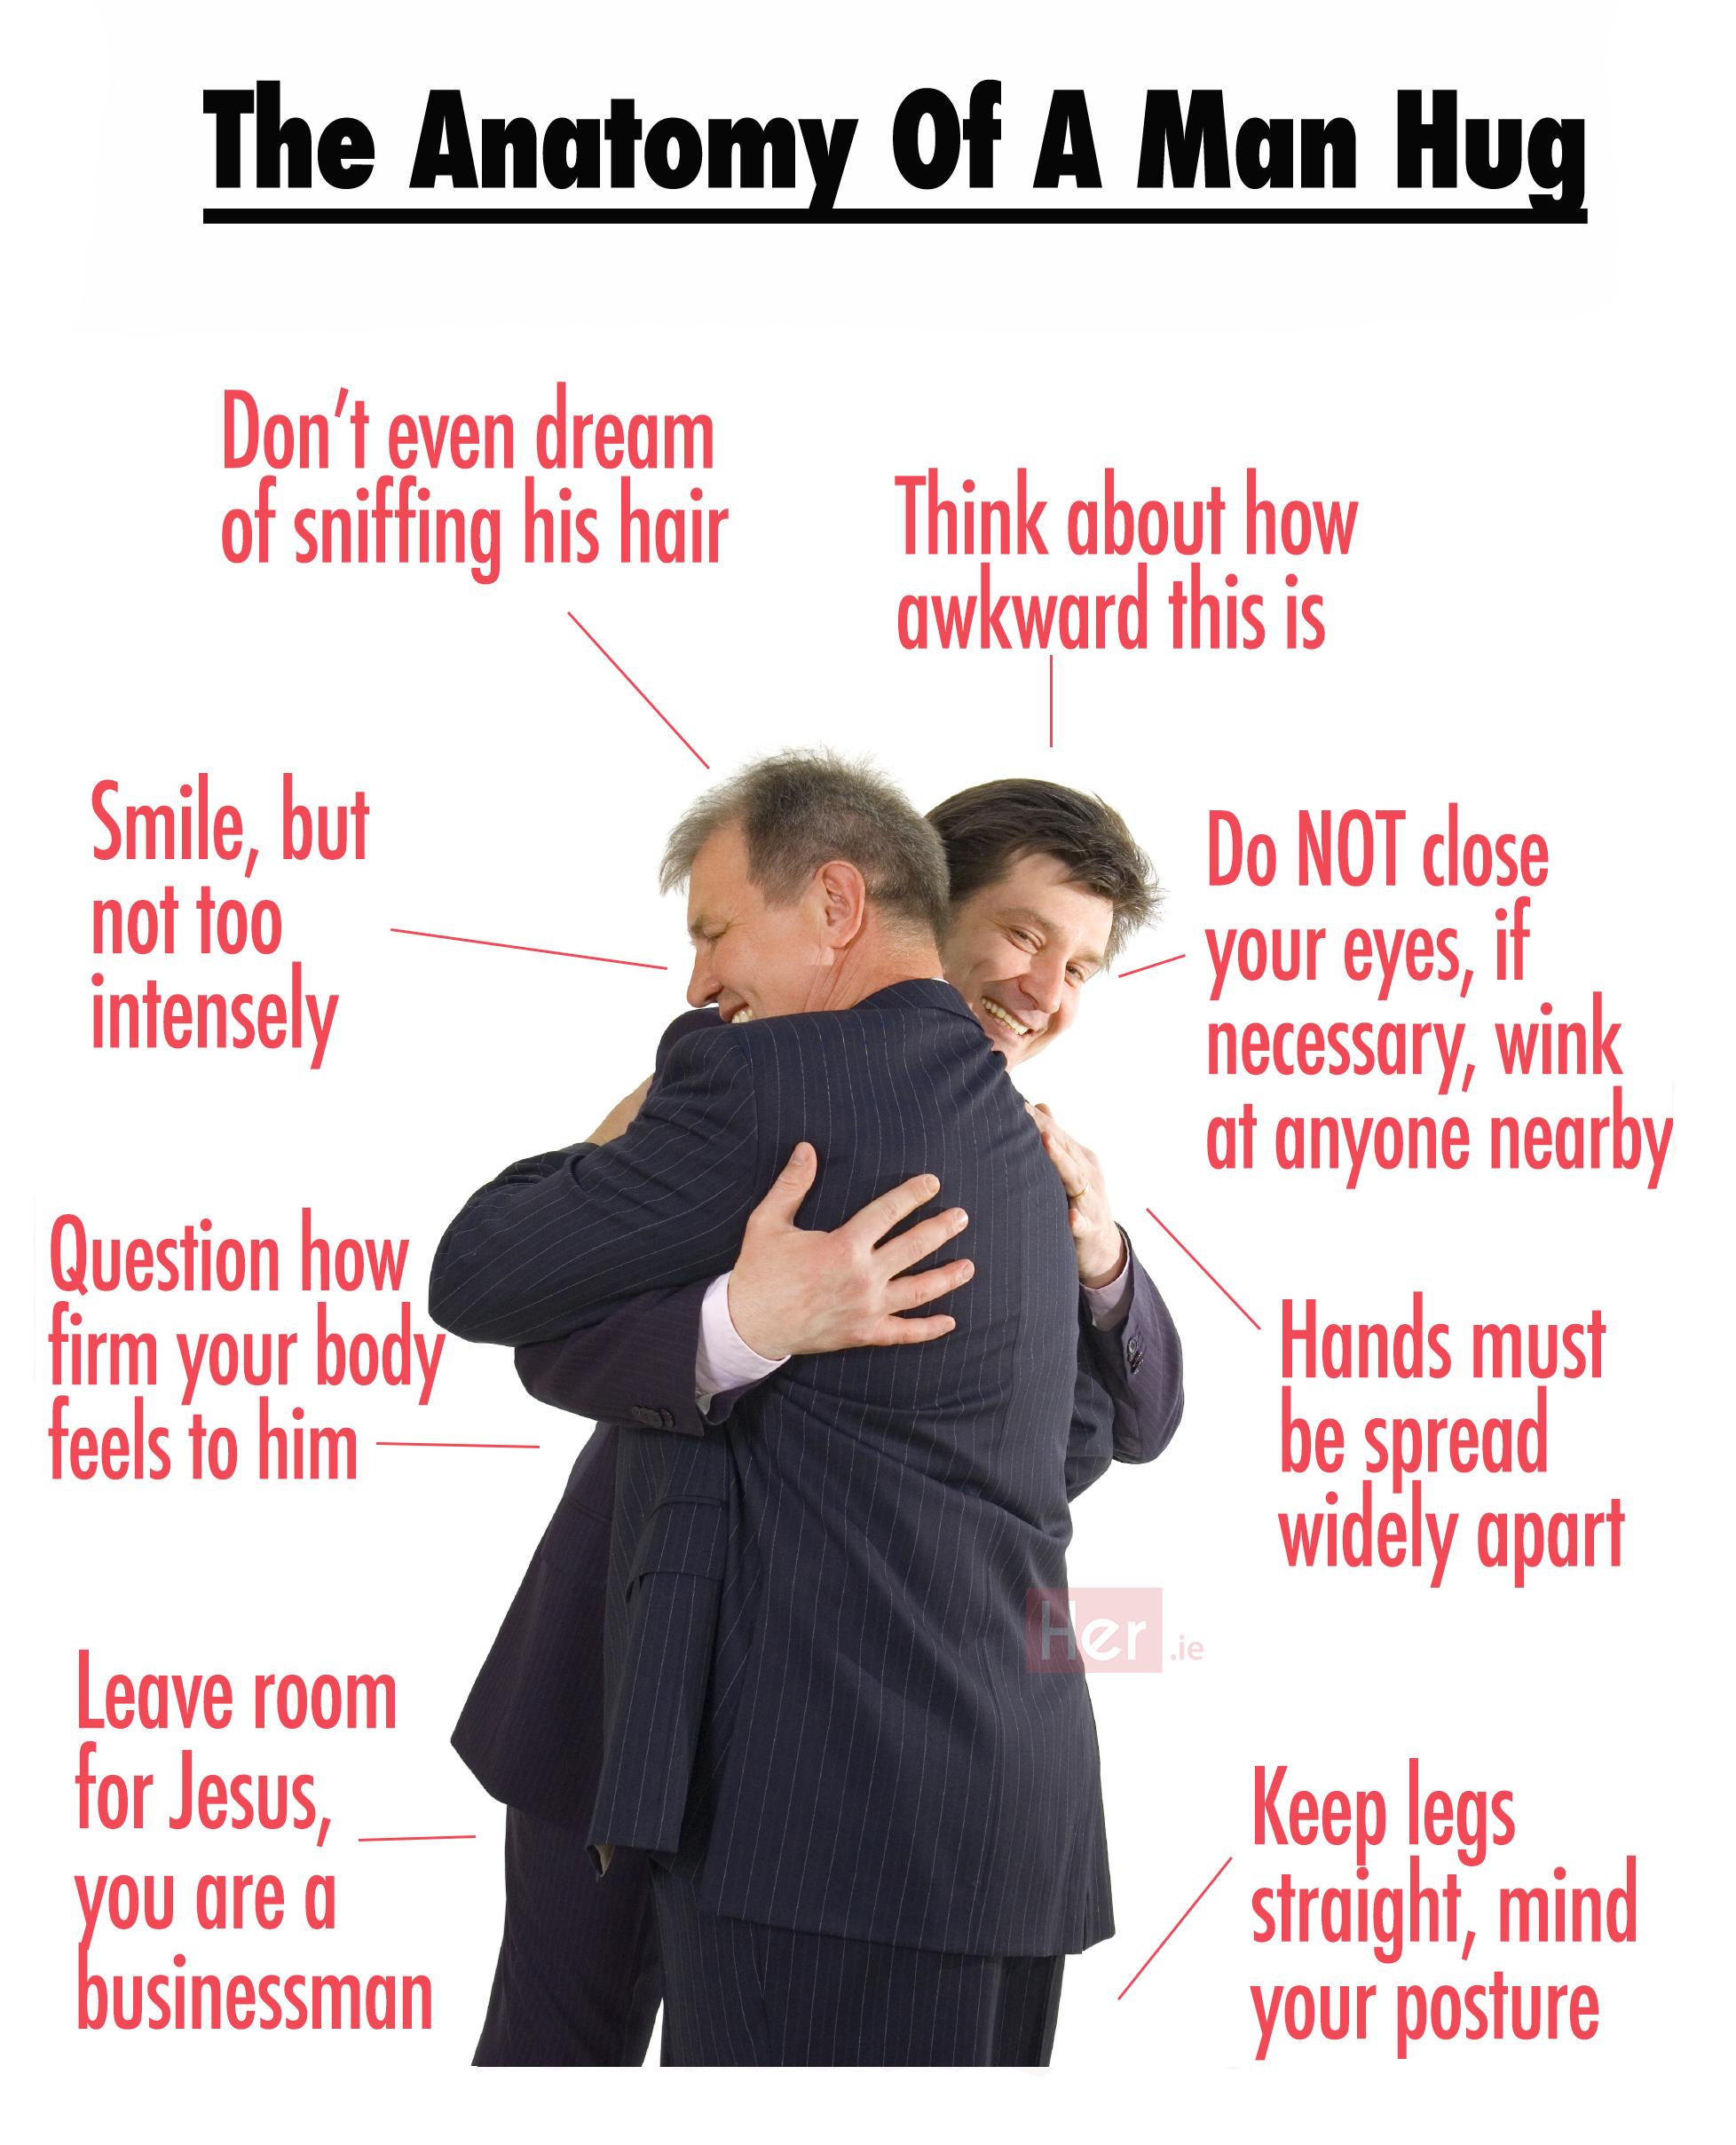 The Anatomy Of An Awkward Man Hug Her